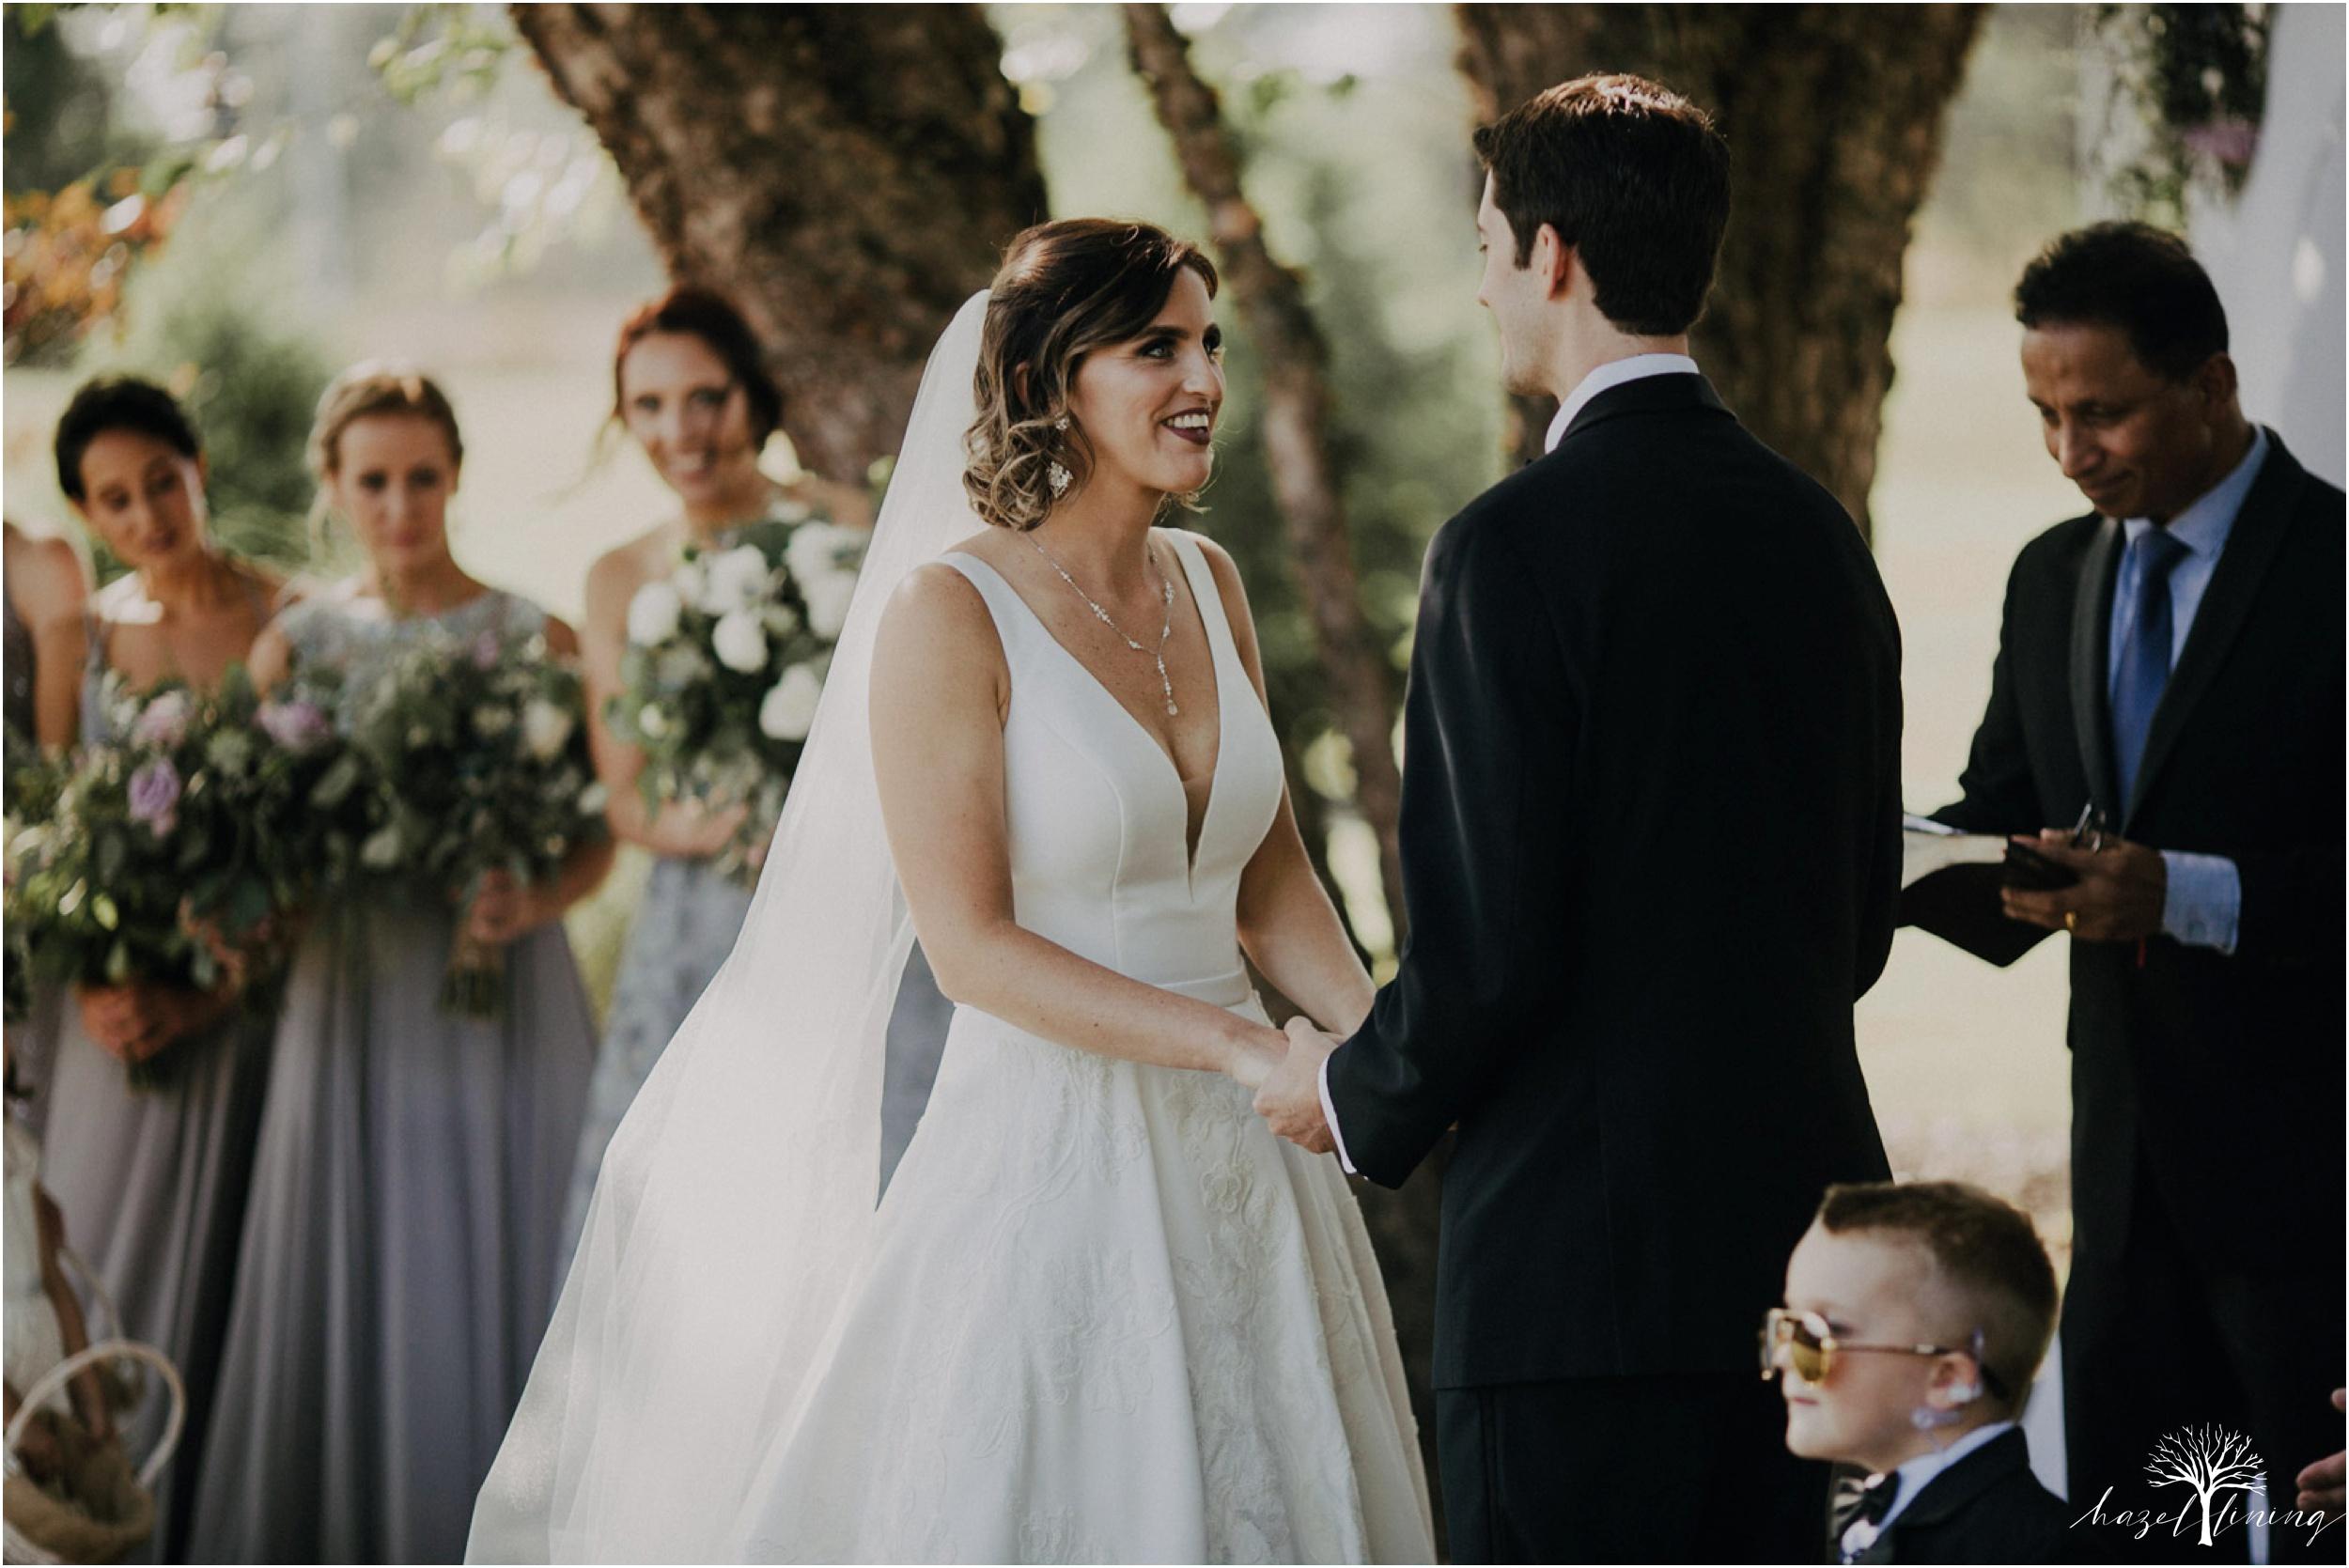 maureen-hepner-anthony-giordano-rose-bank-winery-newtow-pennsylvania-luxury-summer-wedding-hazel-lining-photography-destination-elopement-wedding-engagement-photography_0070.jpg